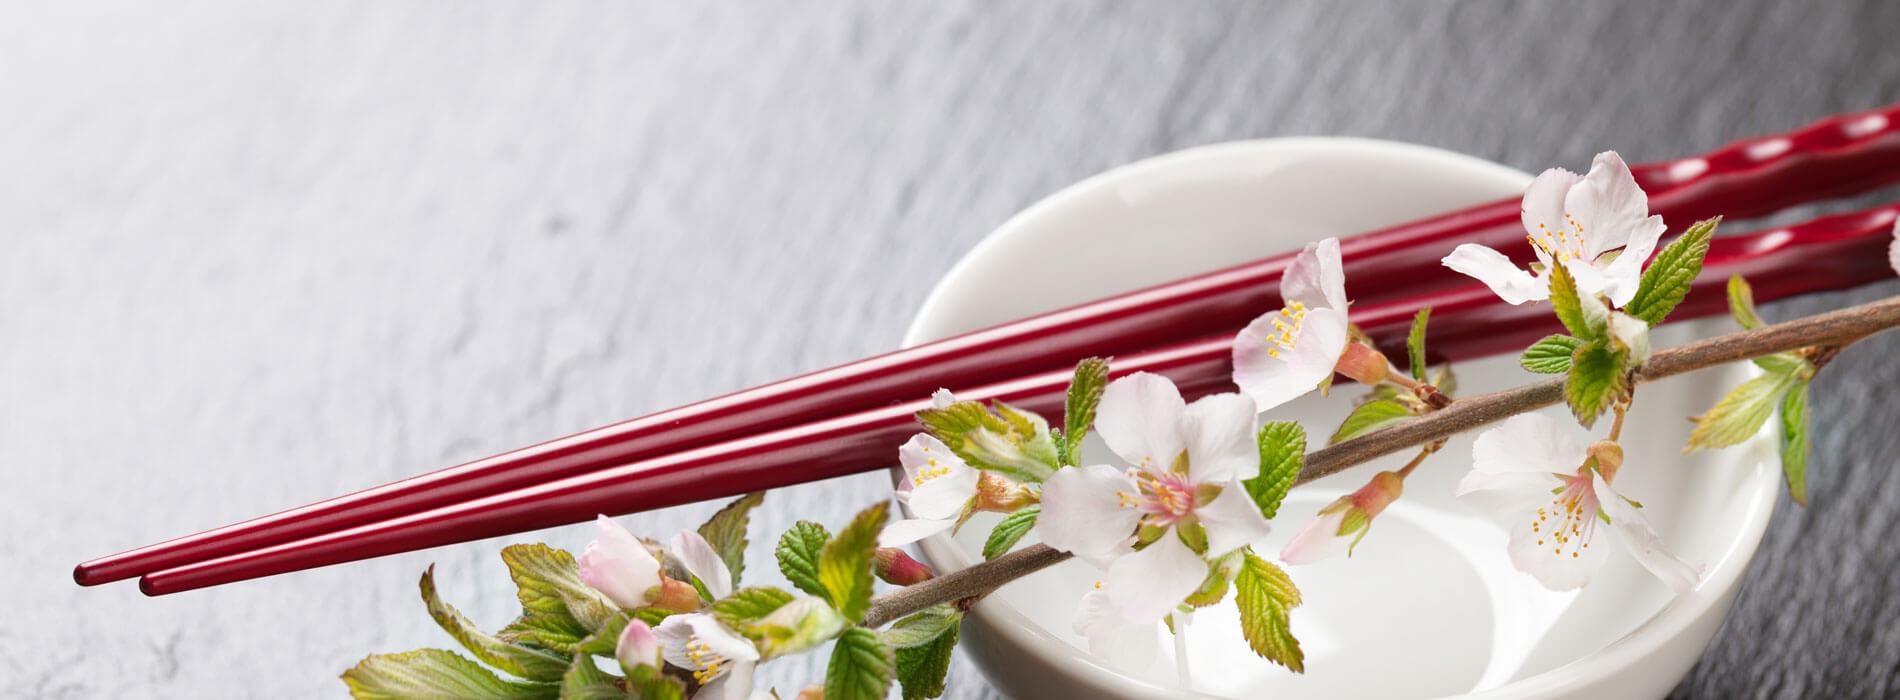 Chopsticks Slider Banner Image 1900x700px